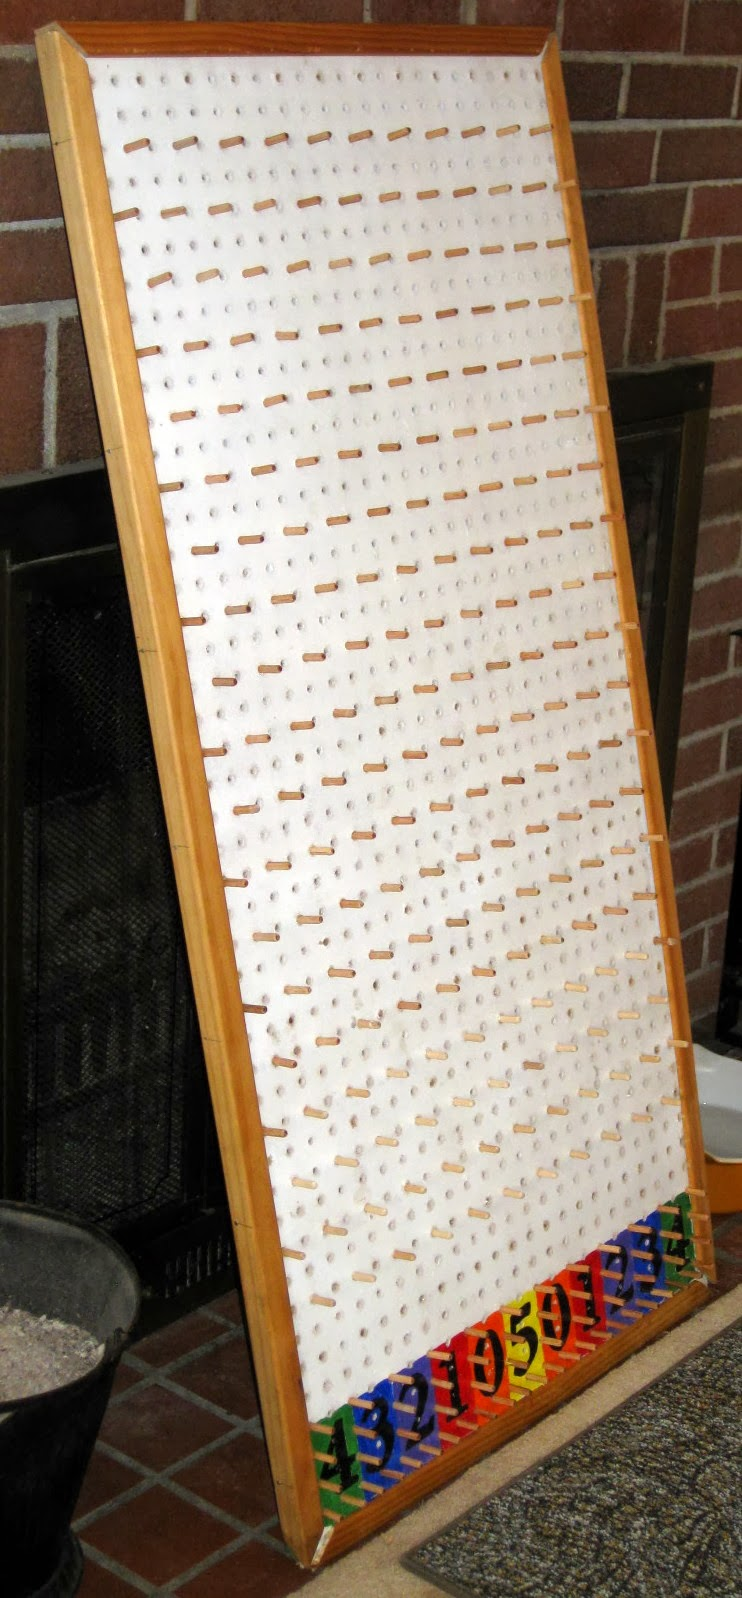 How I made my Plinko Board: Homemade Plinko Board for Carnival